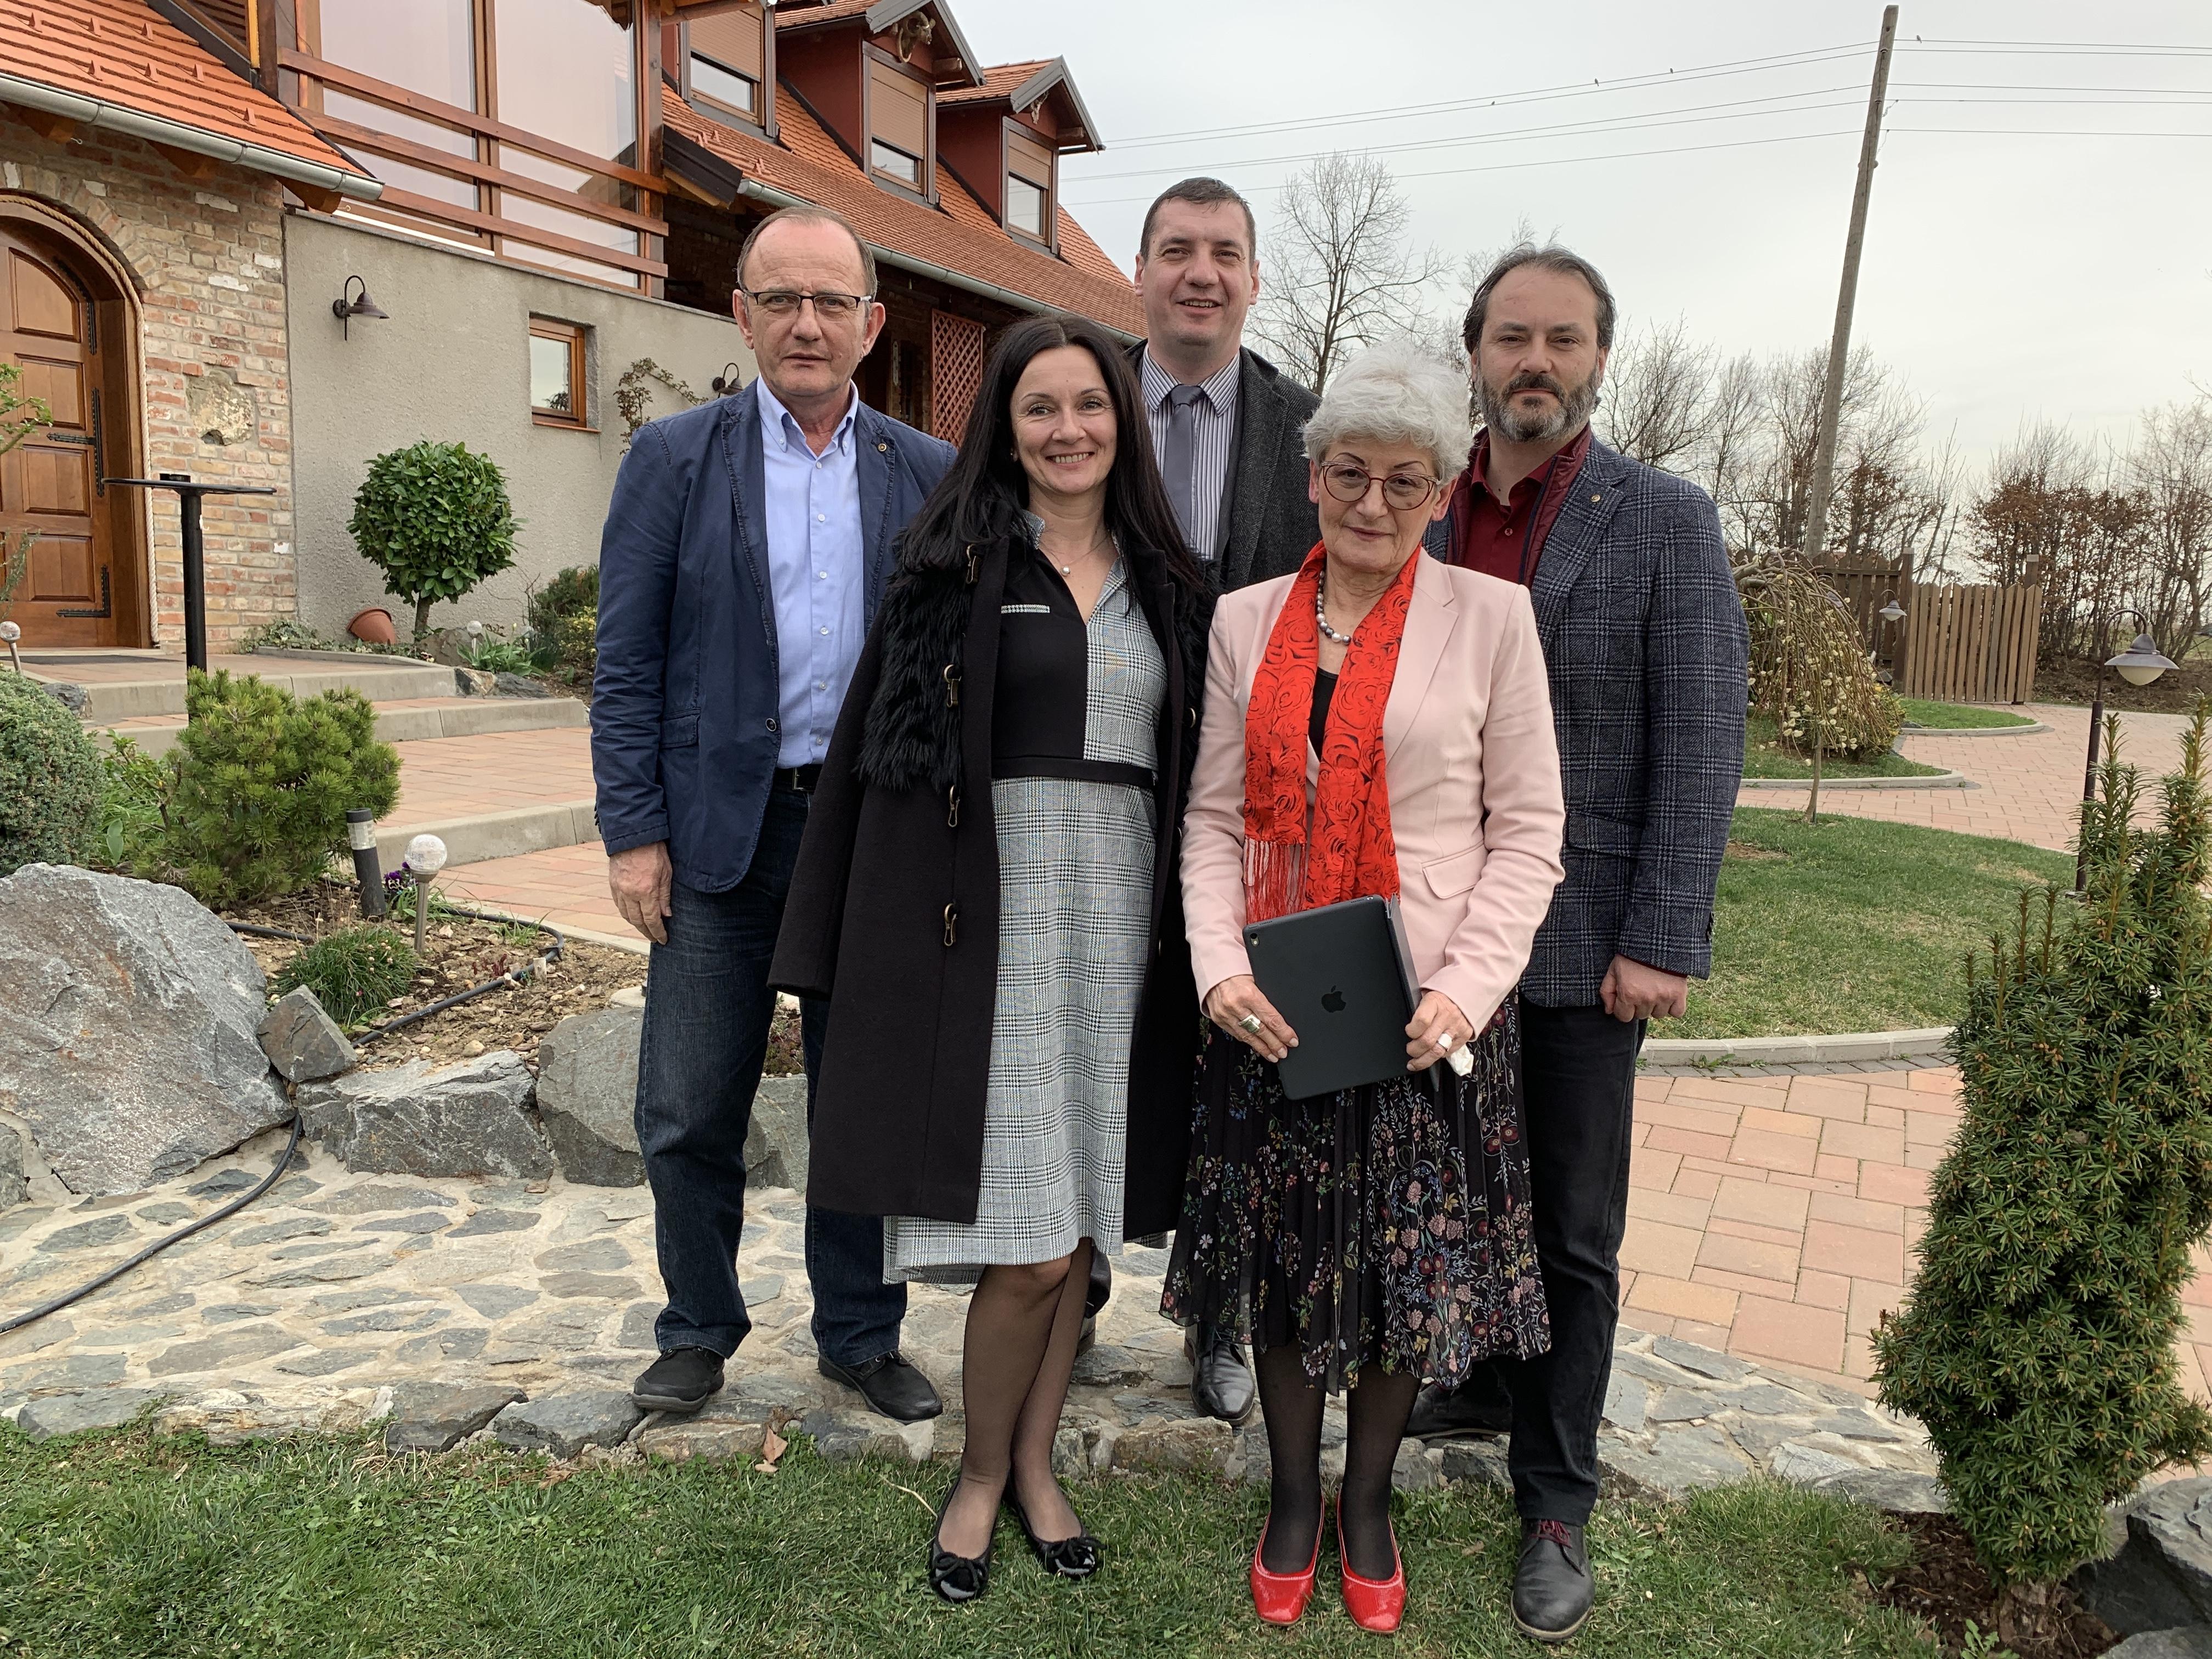 BiH and Croatian delegations met in Starci Village, Croatia